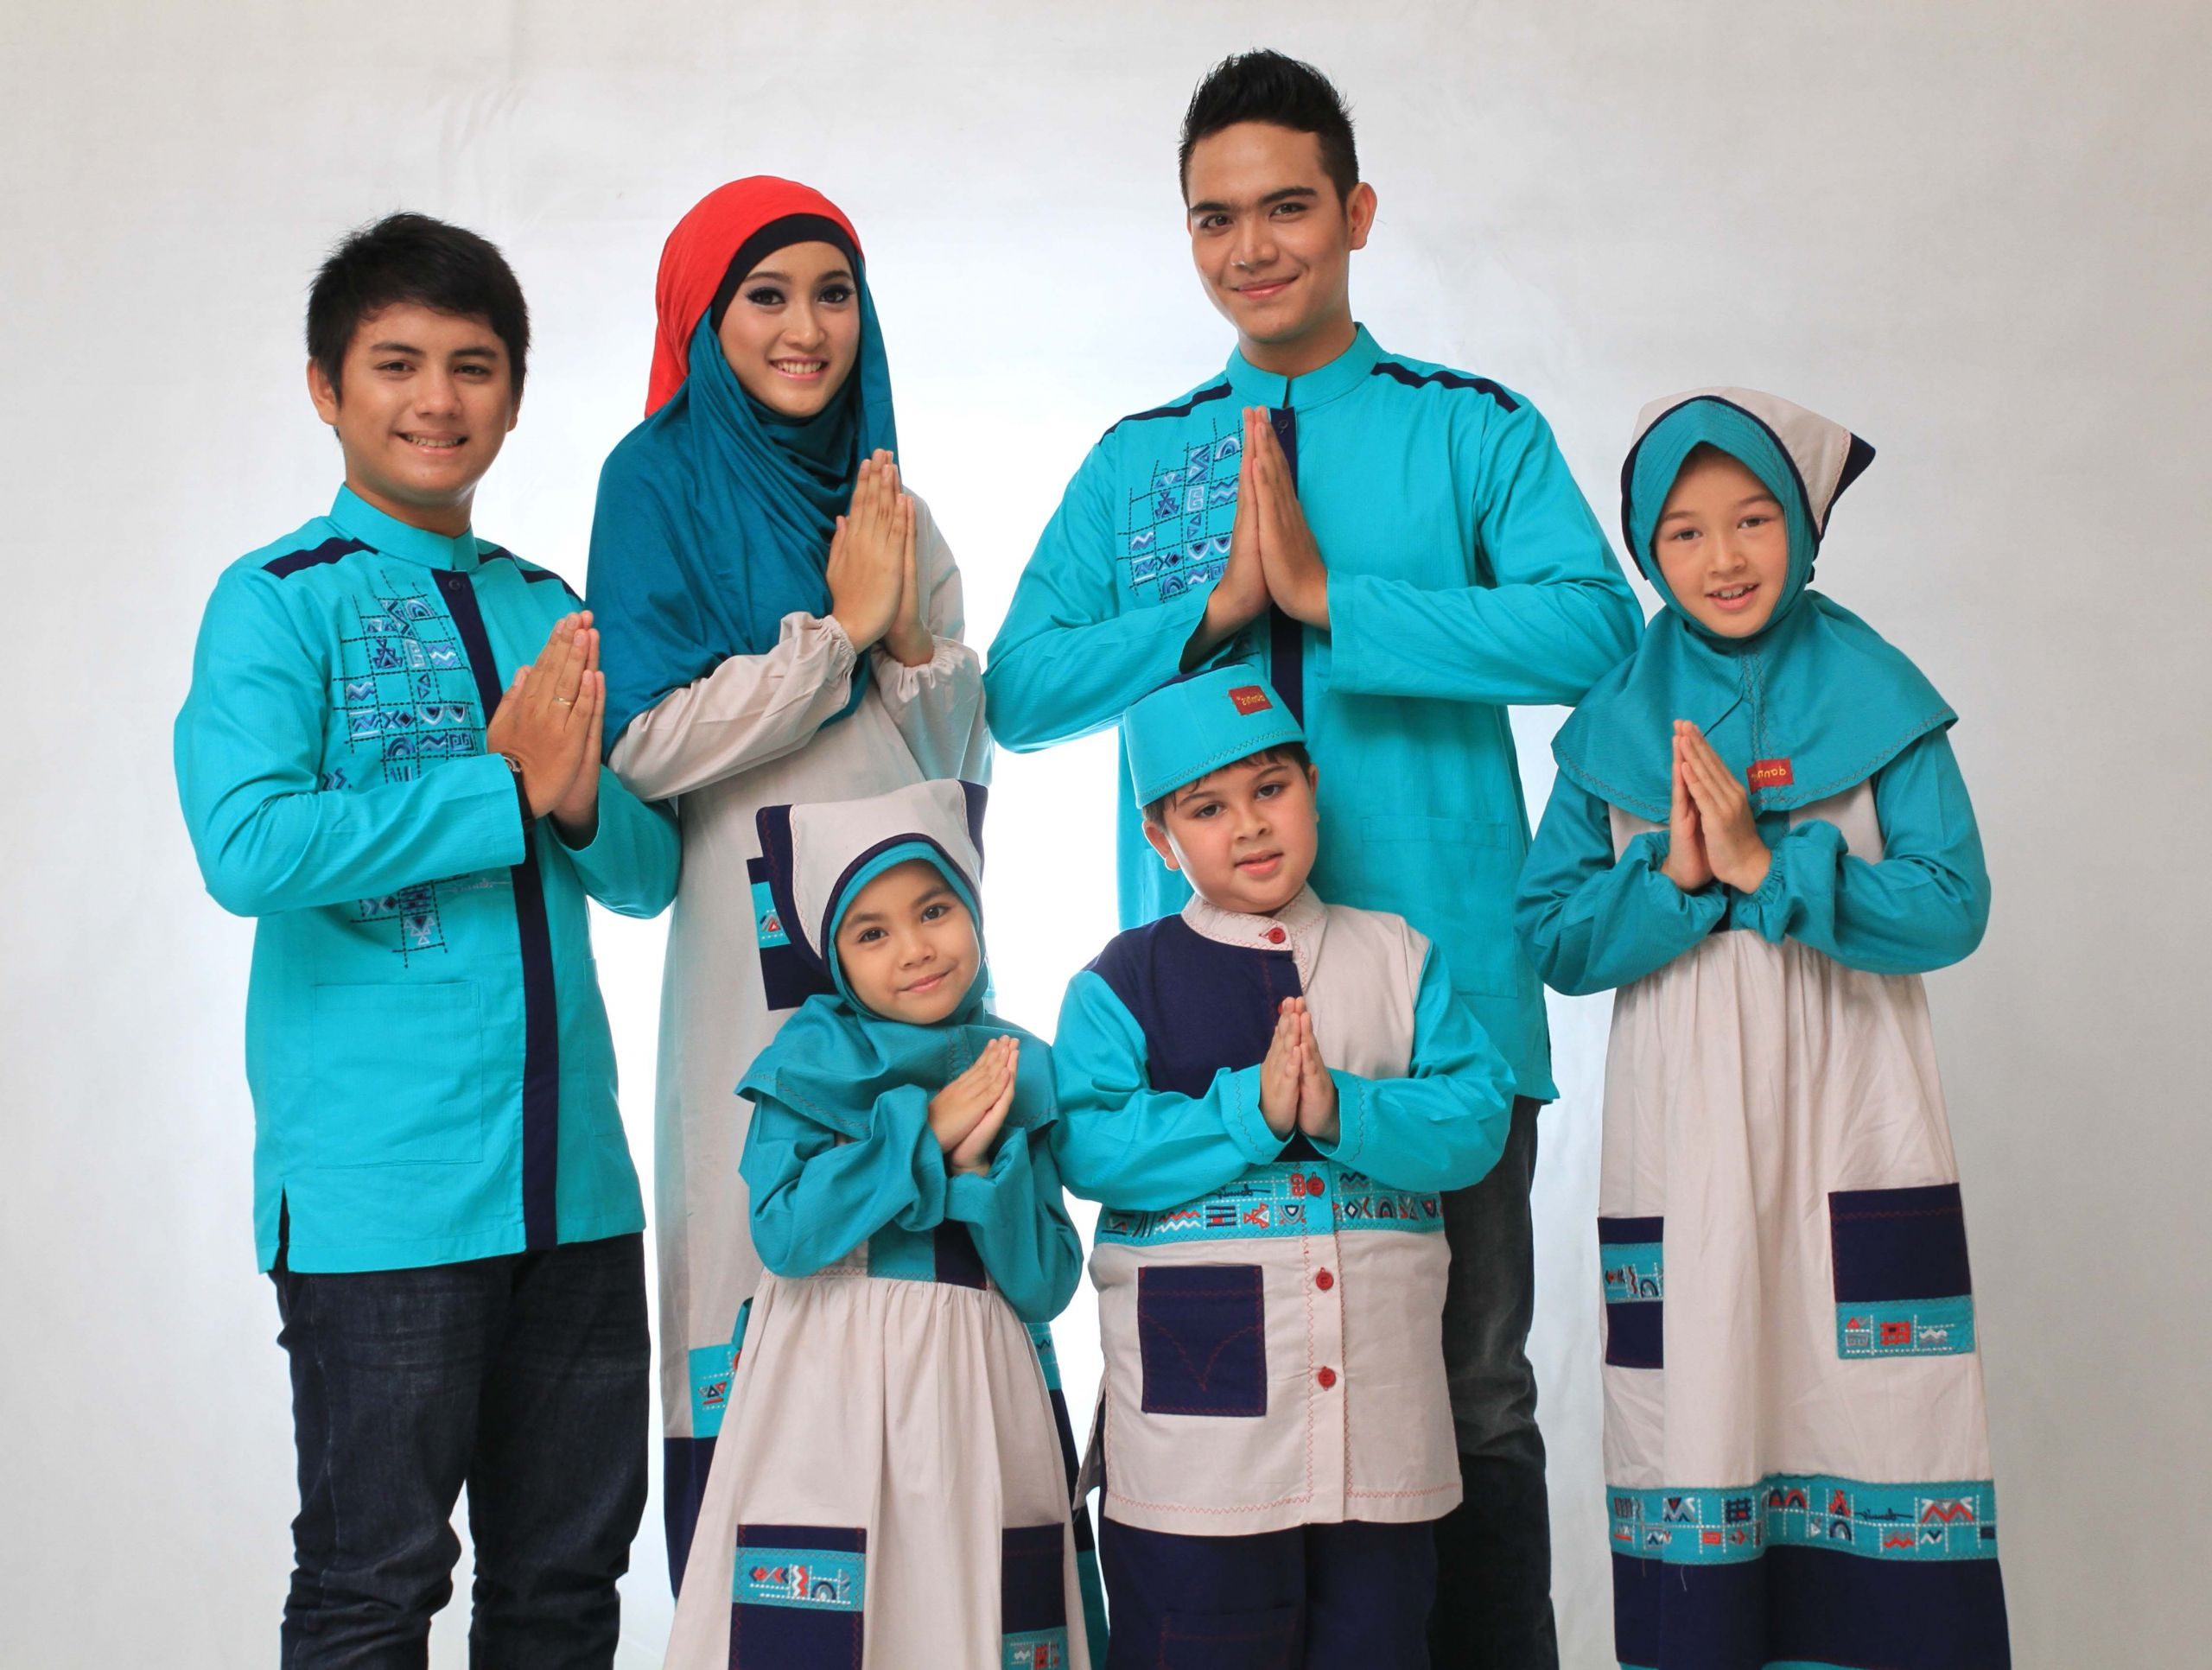 Model Baju Lebaran Yg Terbaru Tqd3 Baju Muslim Untuk Lebaran Berhijab